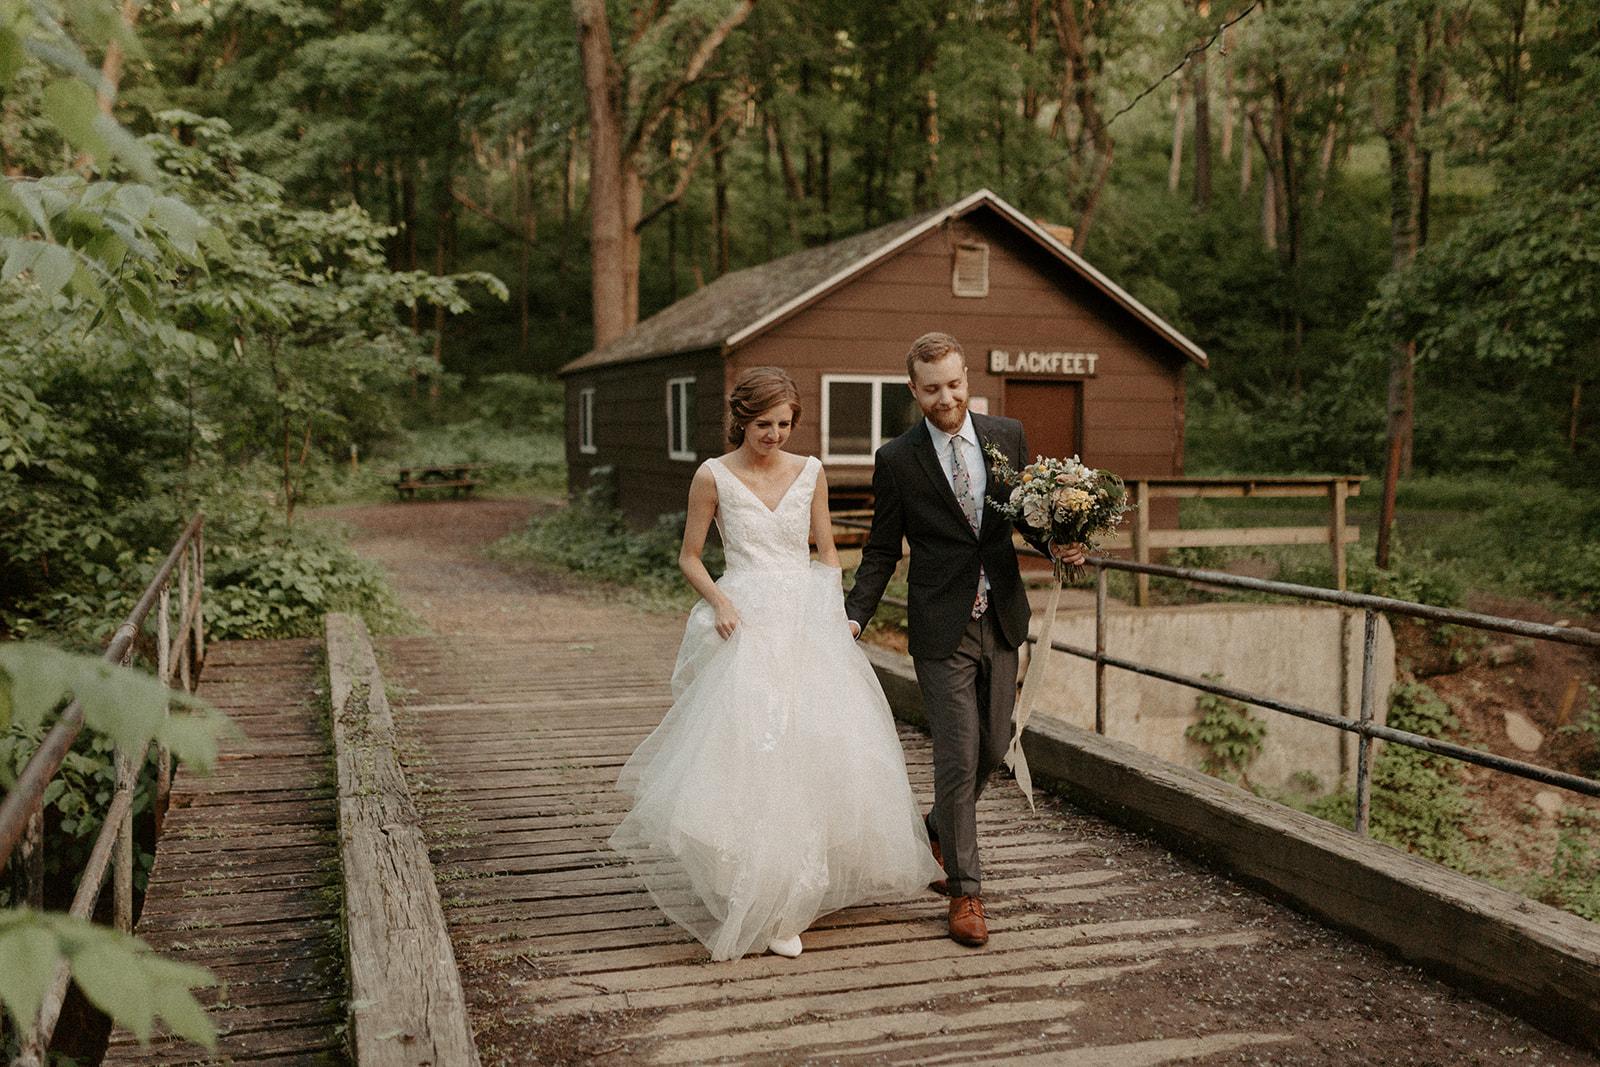 camp_wokanda_peoria_illinois_wedding_photographer_wright_photographs_bliese_0830.jpg